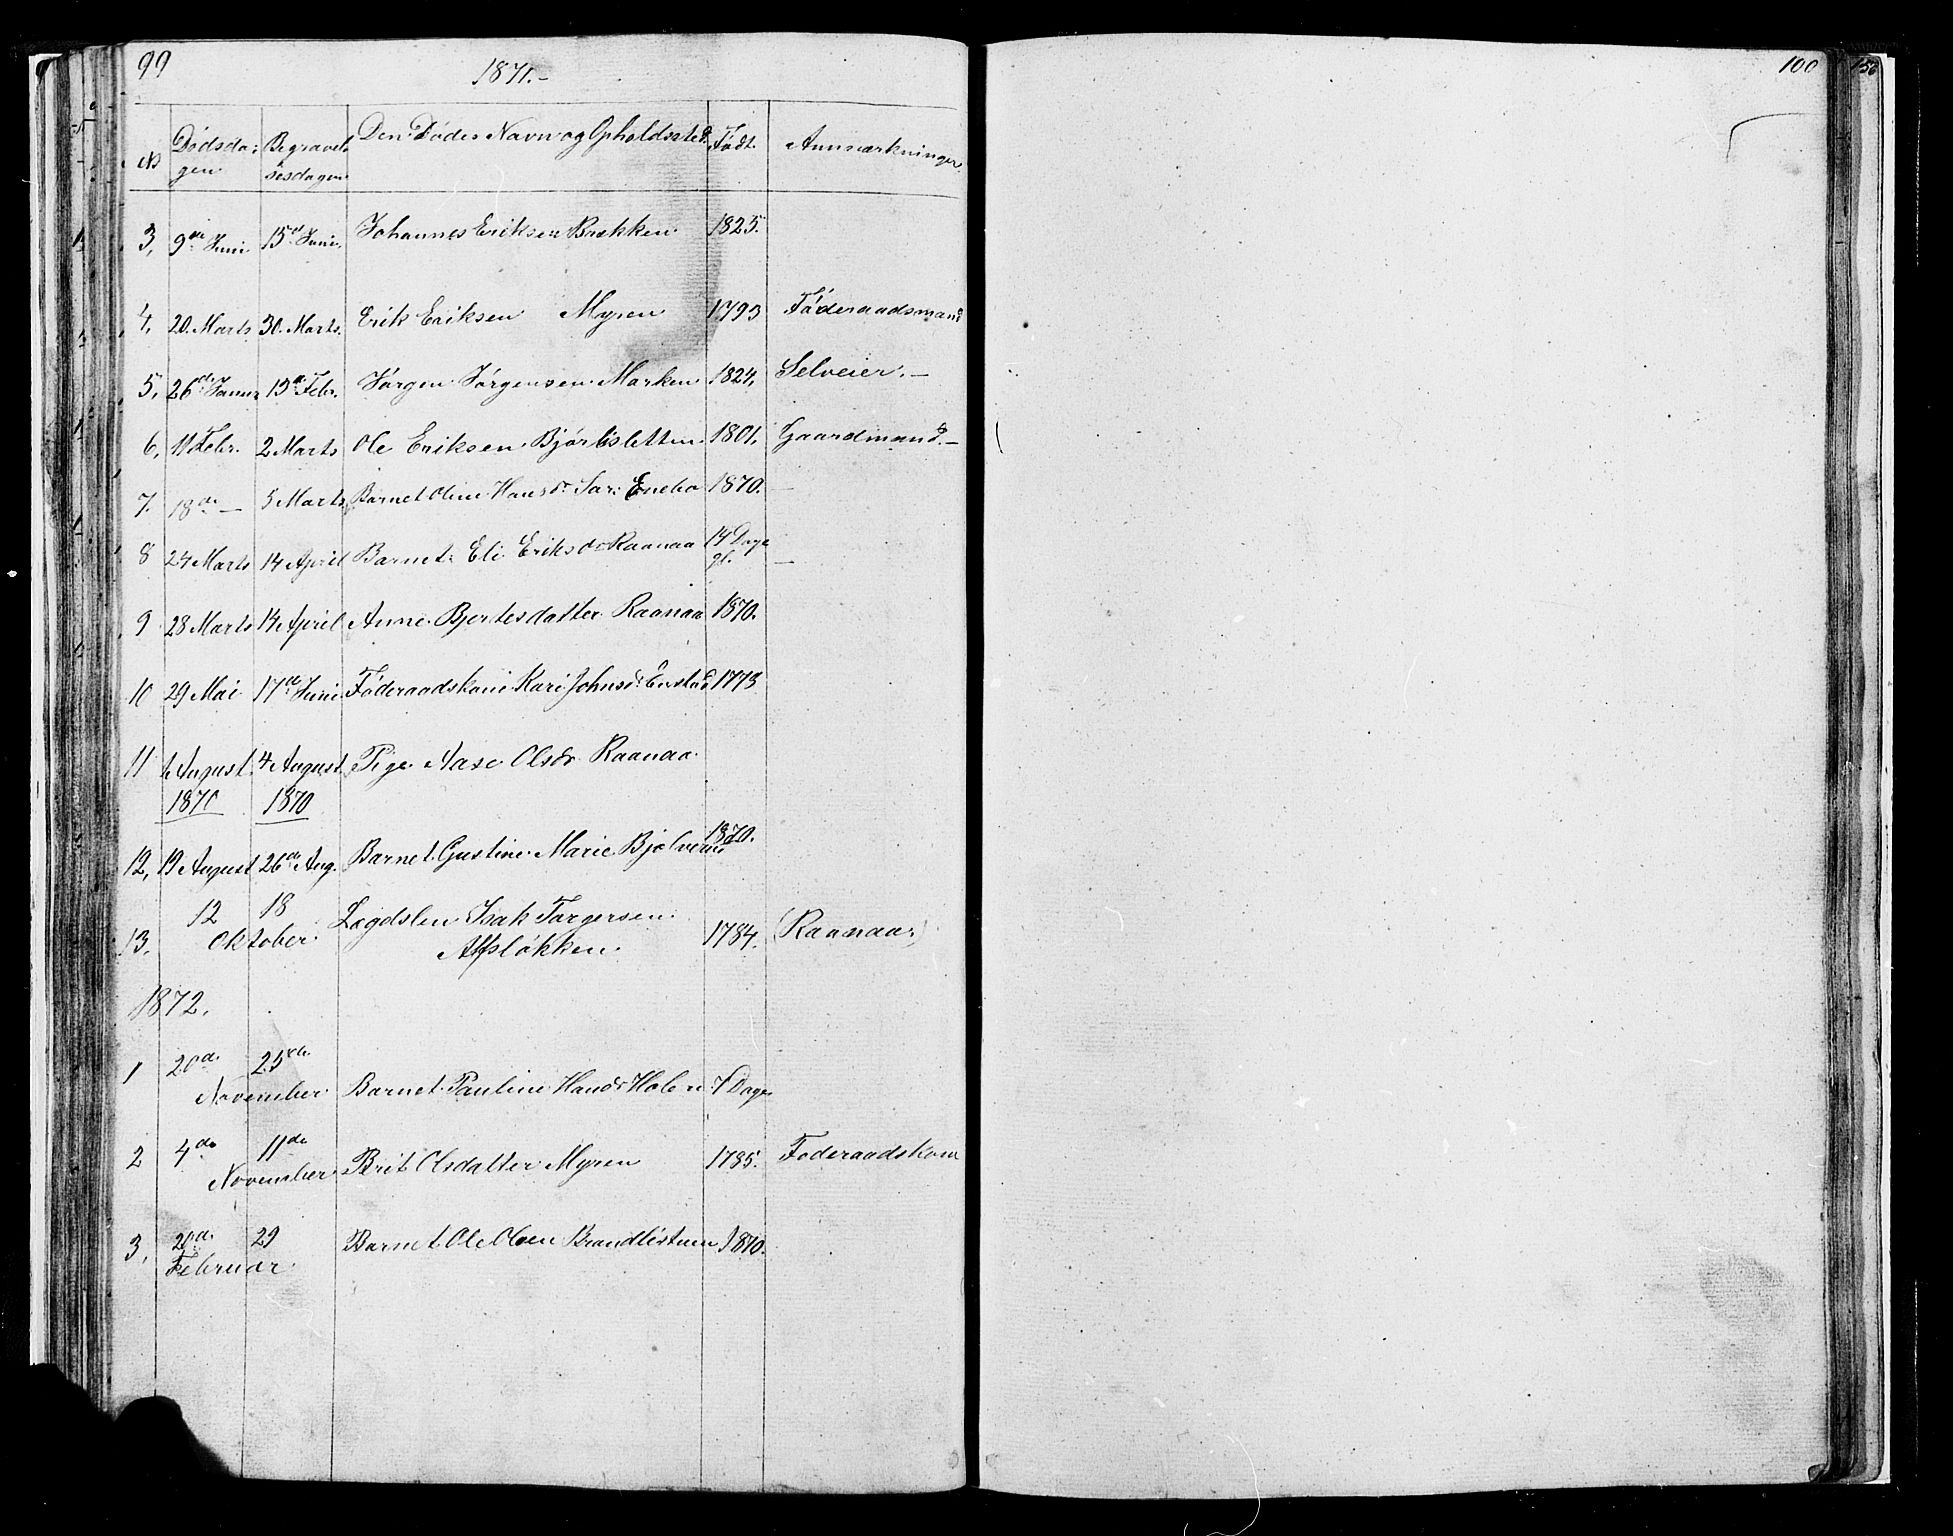 SAH, Lesja prestekontor, Klokkerbok nr. 4, 1842-1871, s. 99-100